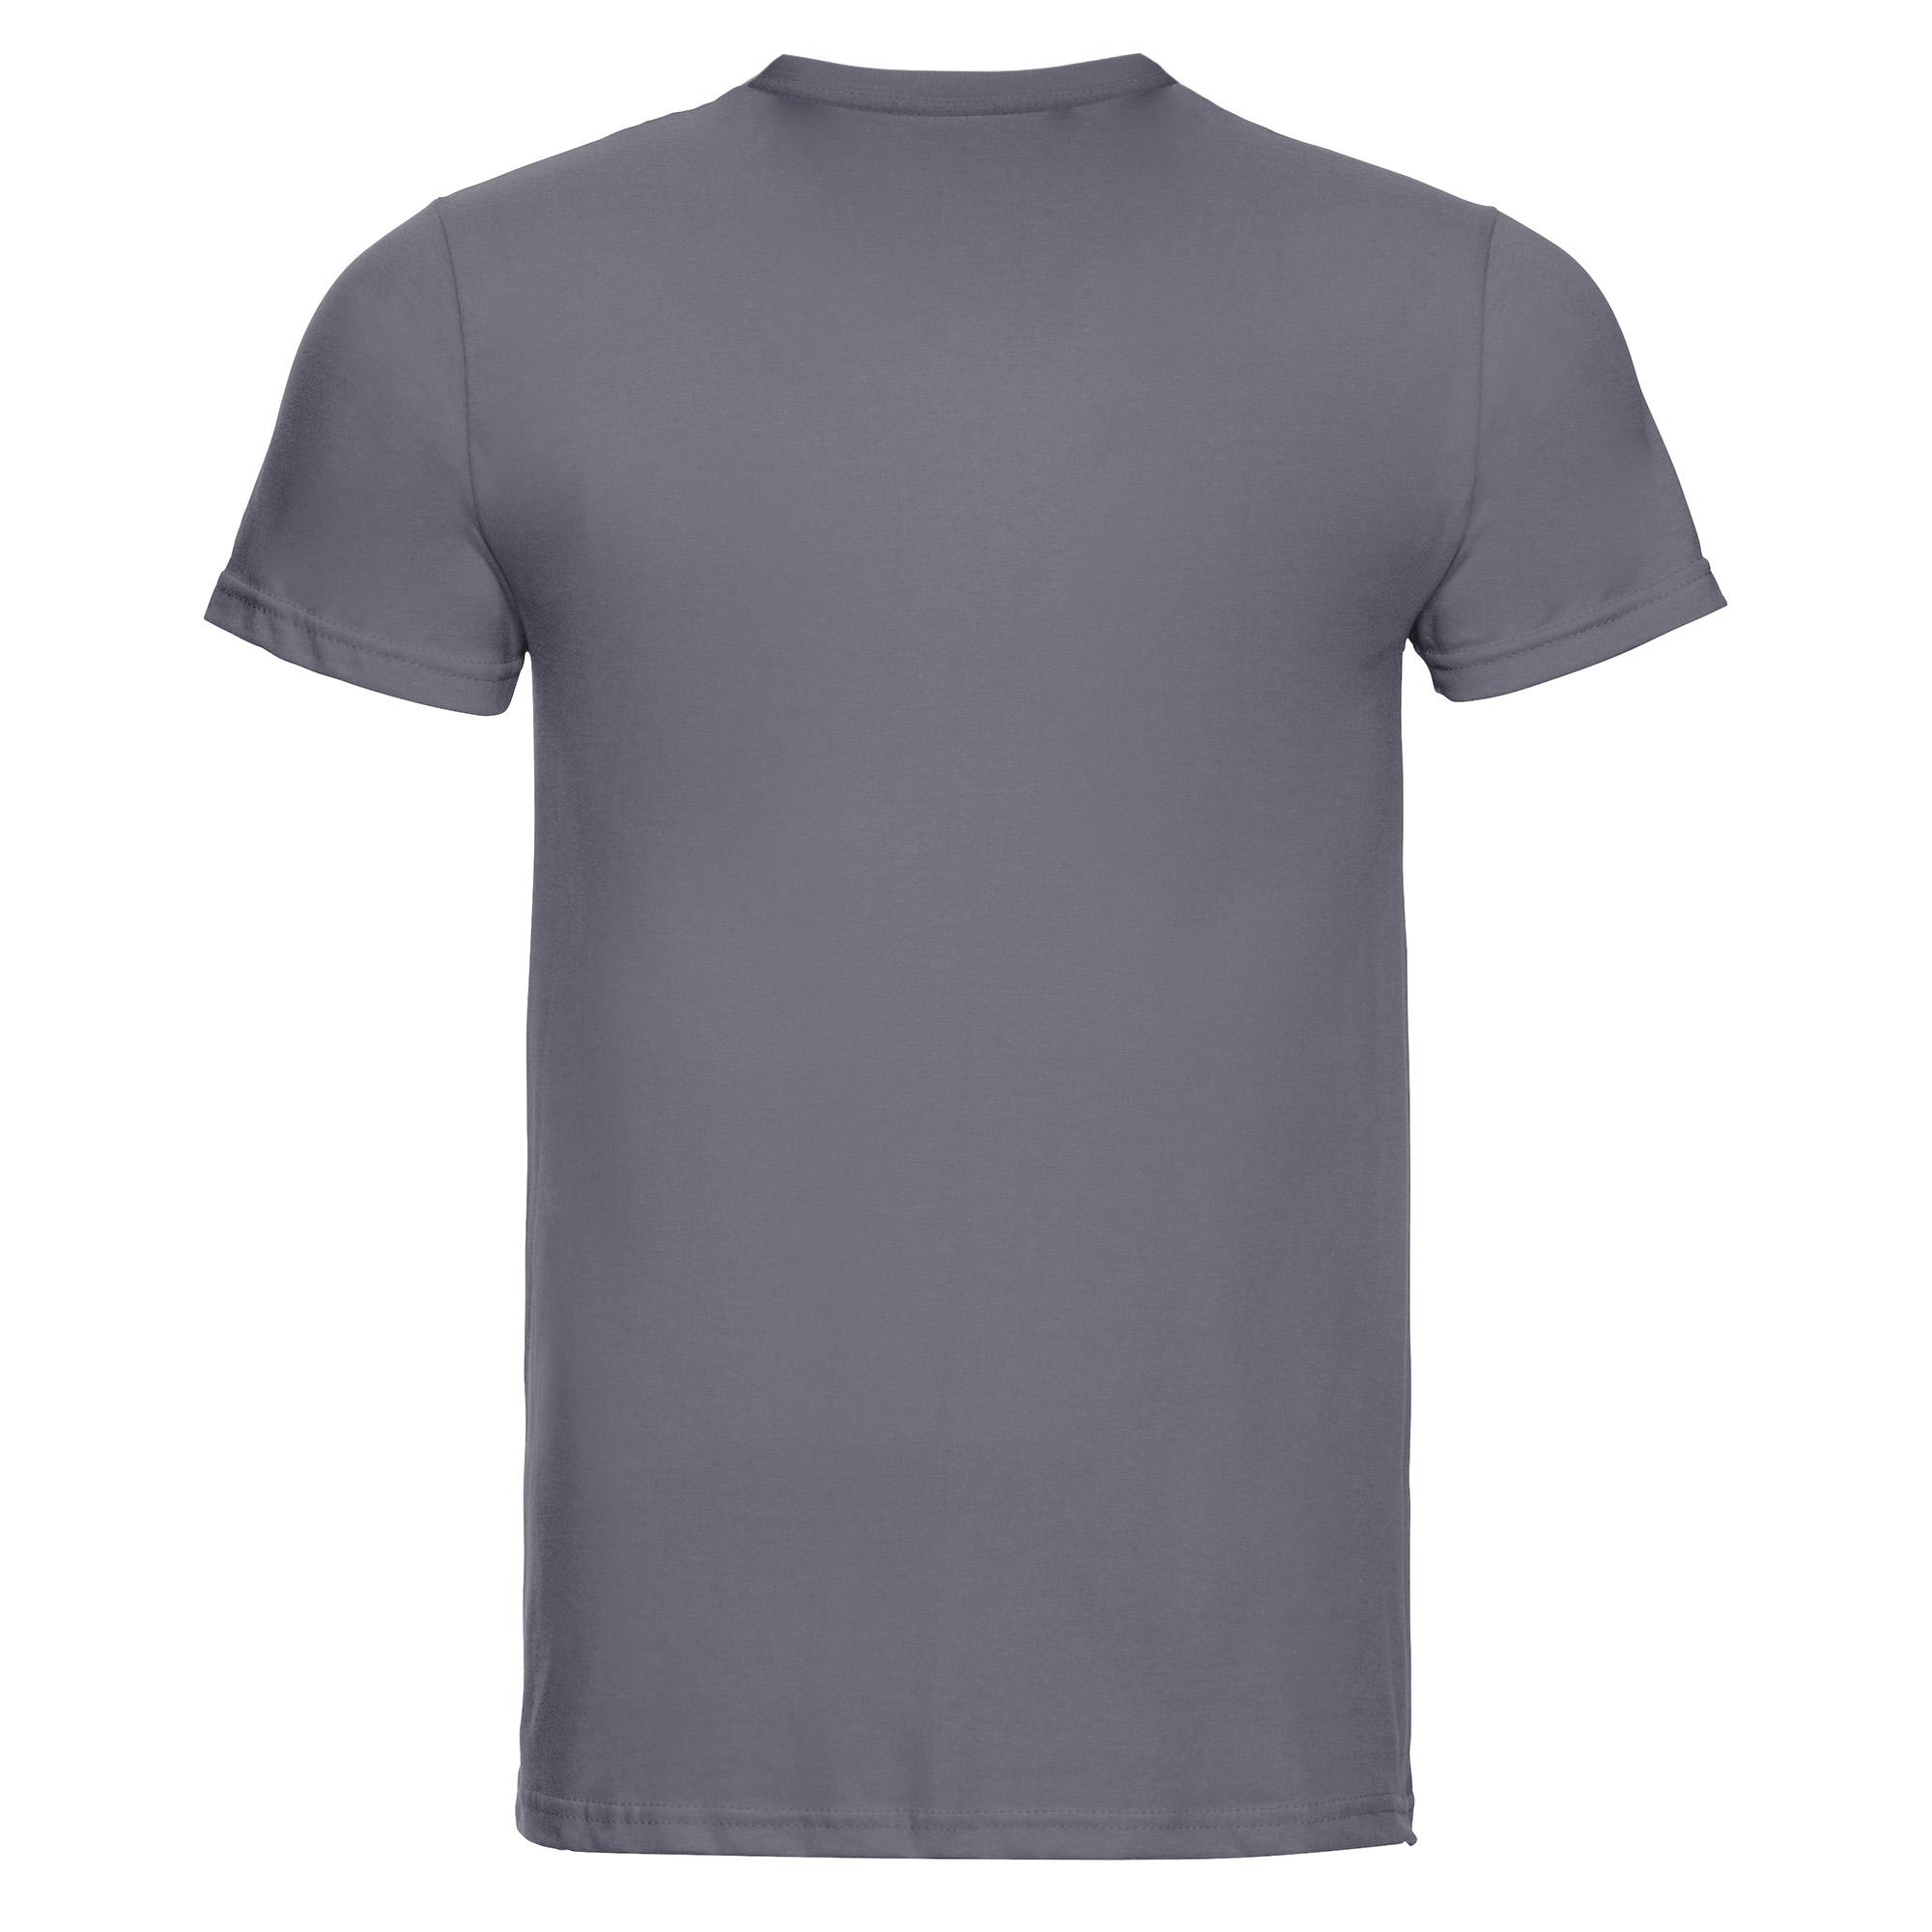 Russell-Mens-Slim-Plain-Blank-100-Cotton-Short-Sleeve-T-Shirt-Tee-BC1515 thumbnail 14